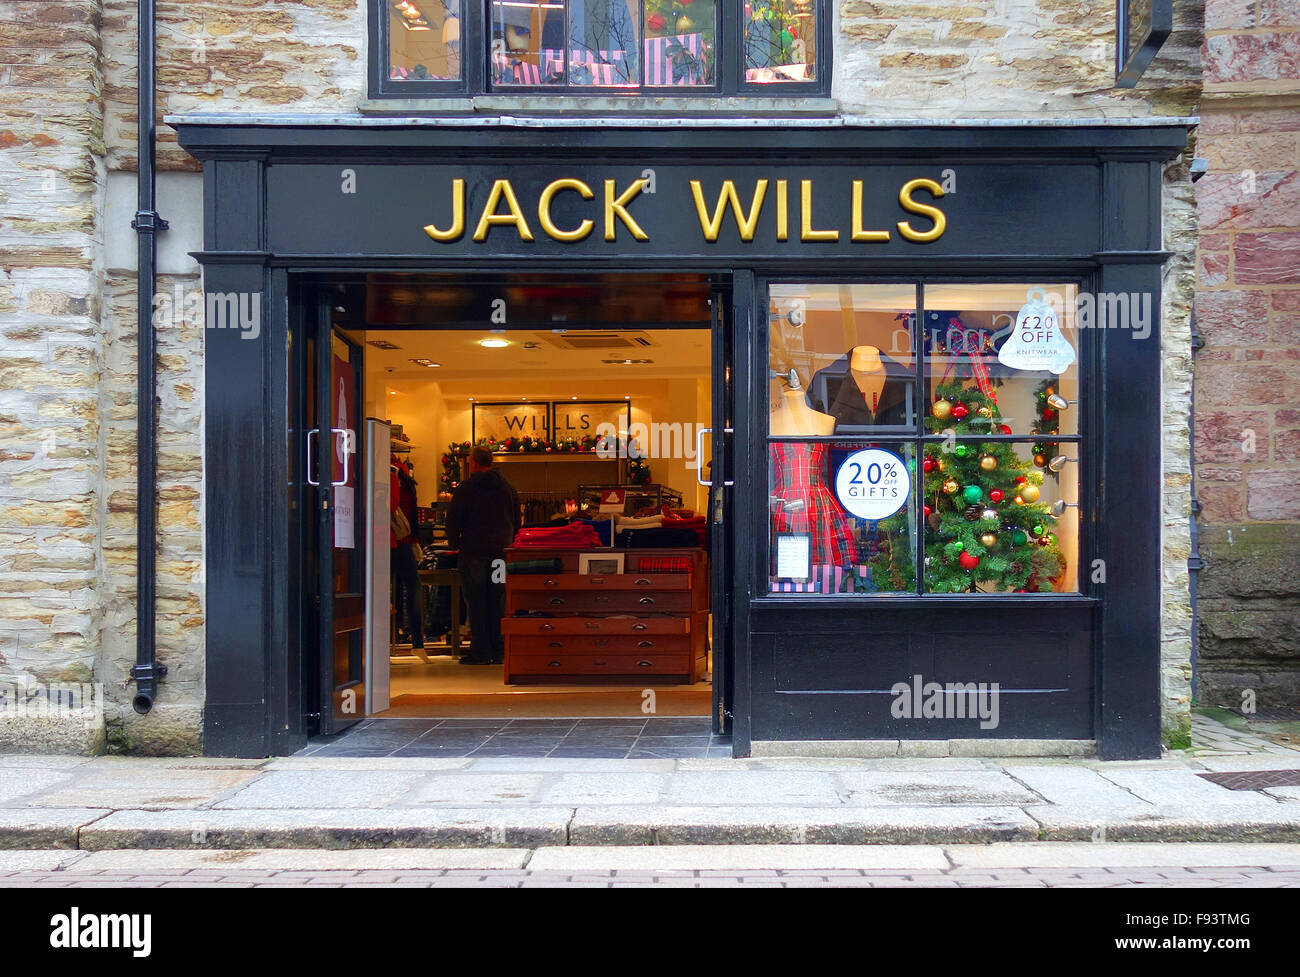 Jack Wills store - Stock Image